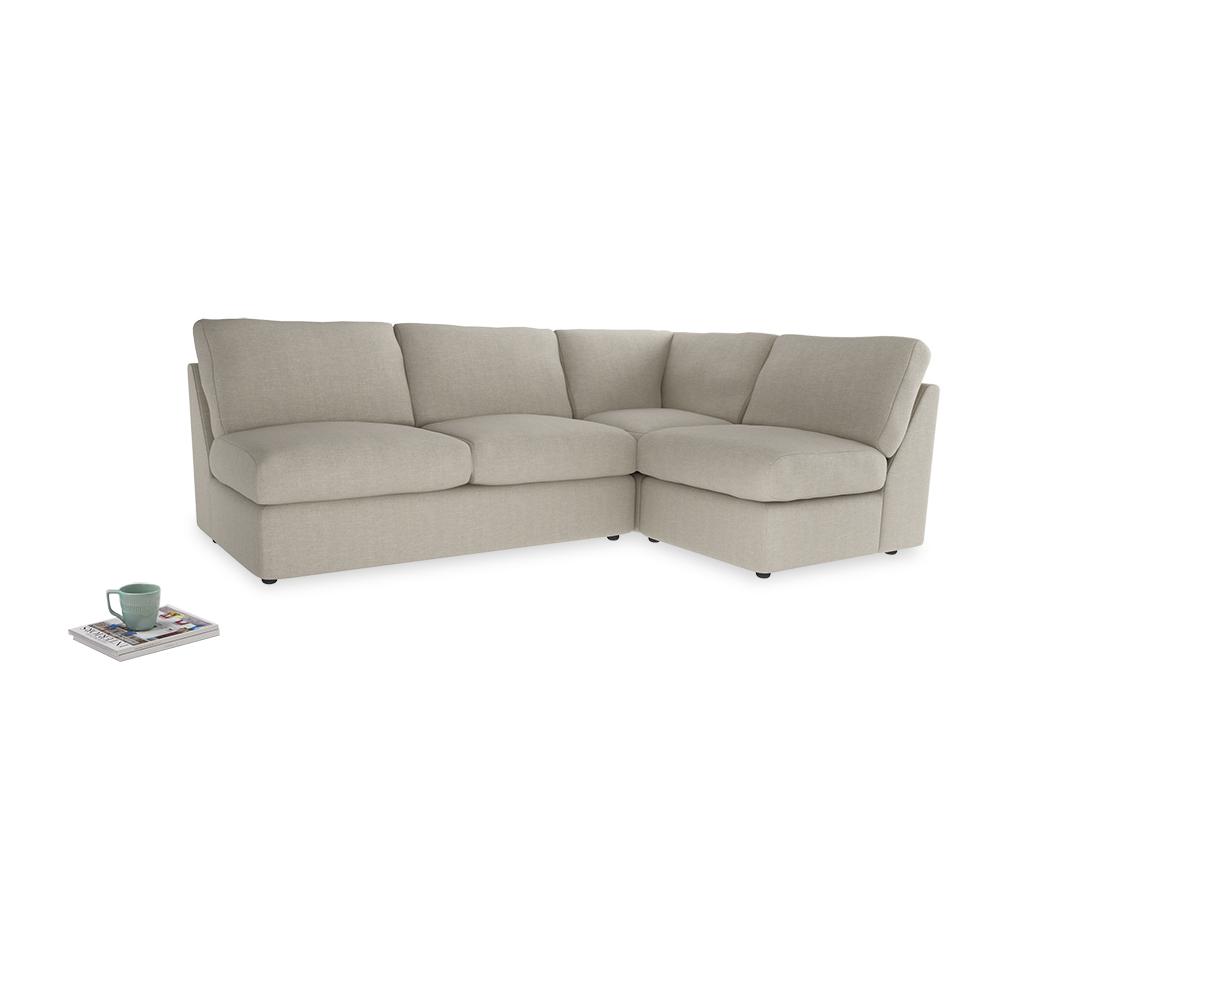 Chatnap modular corner storage sofa